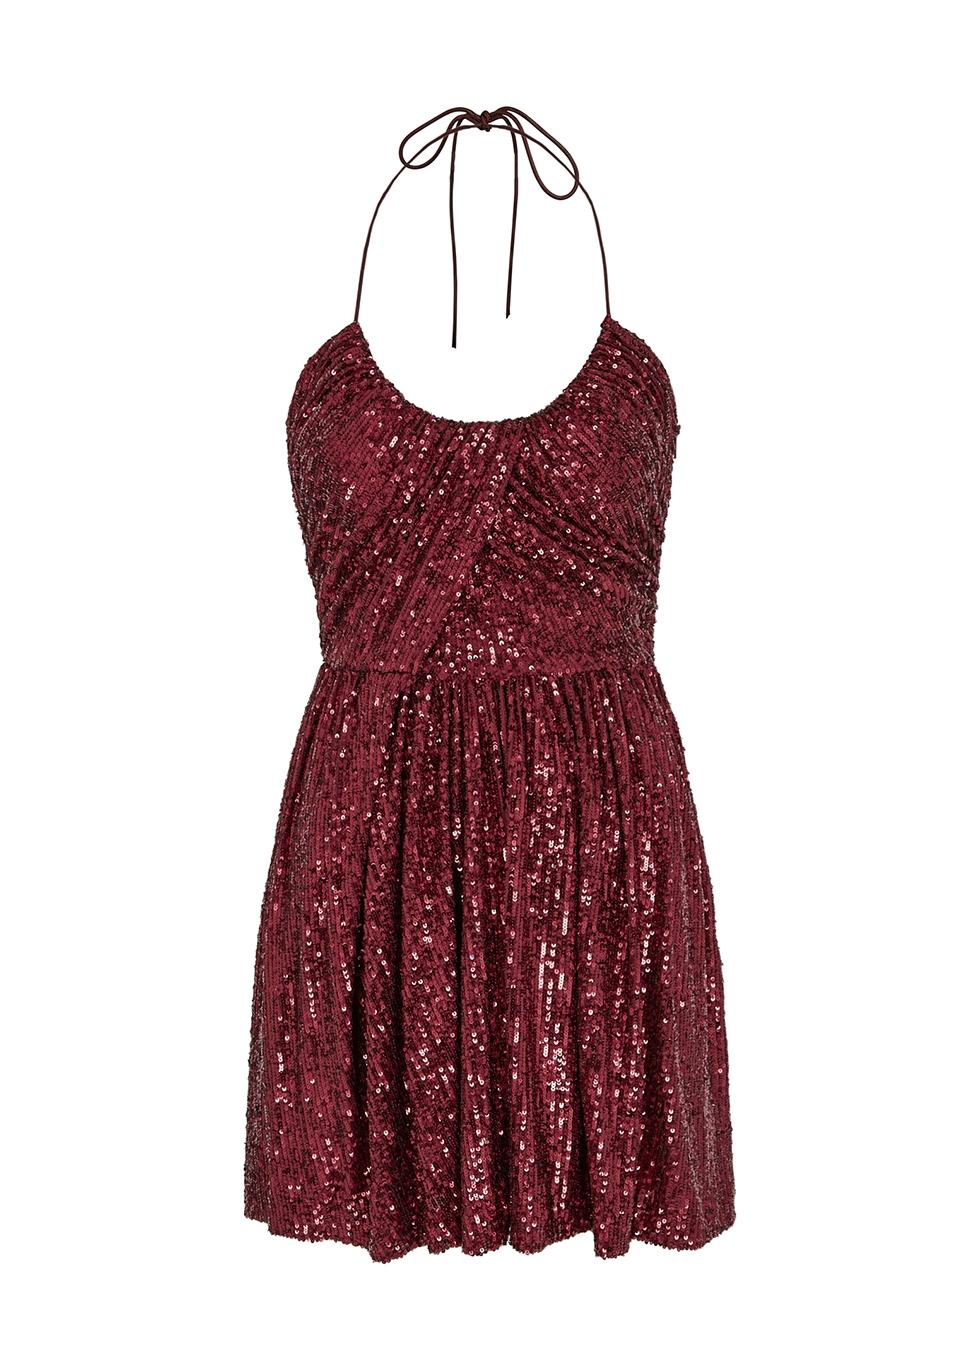 Burgundy sequin mini dress